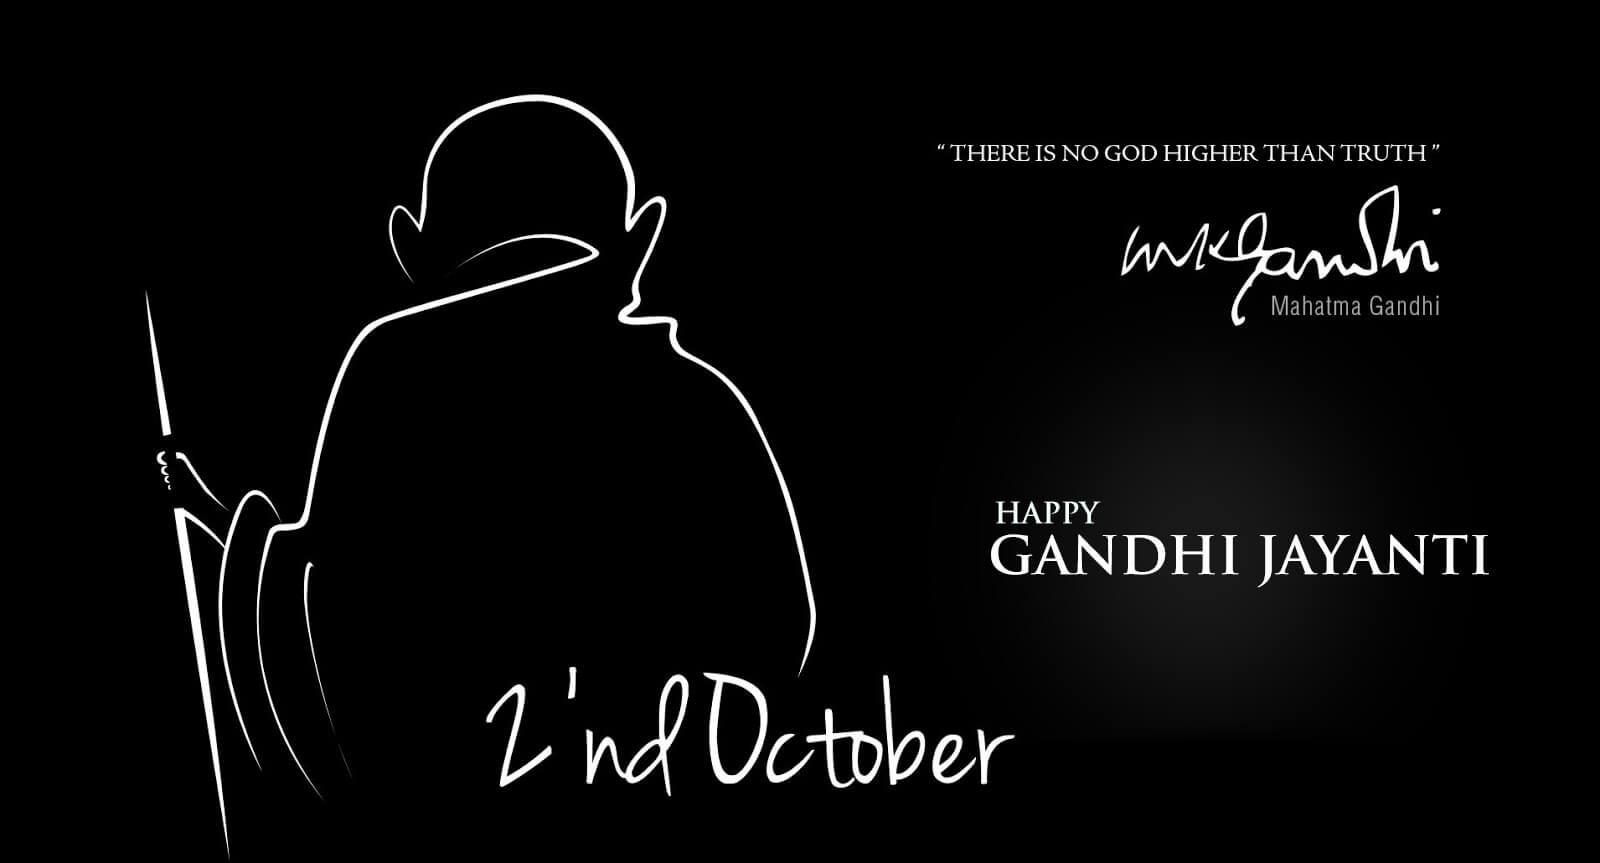 gandhi jayanti quotes october 2 hd image wallpaper